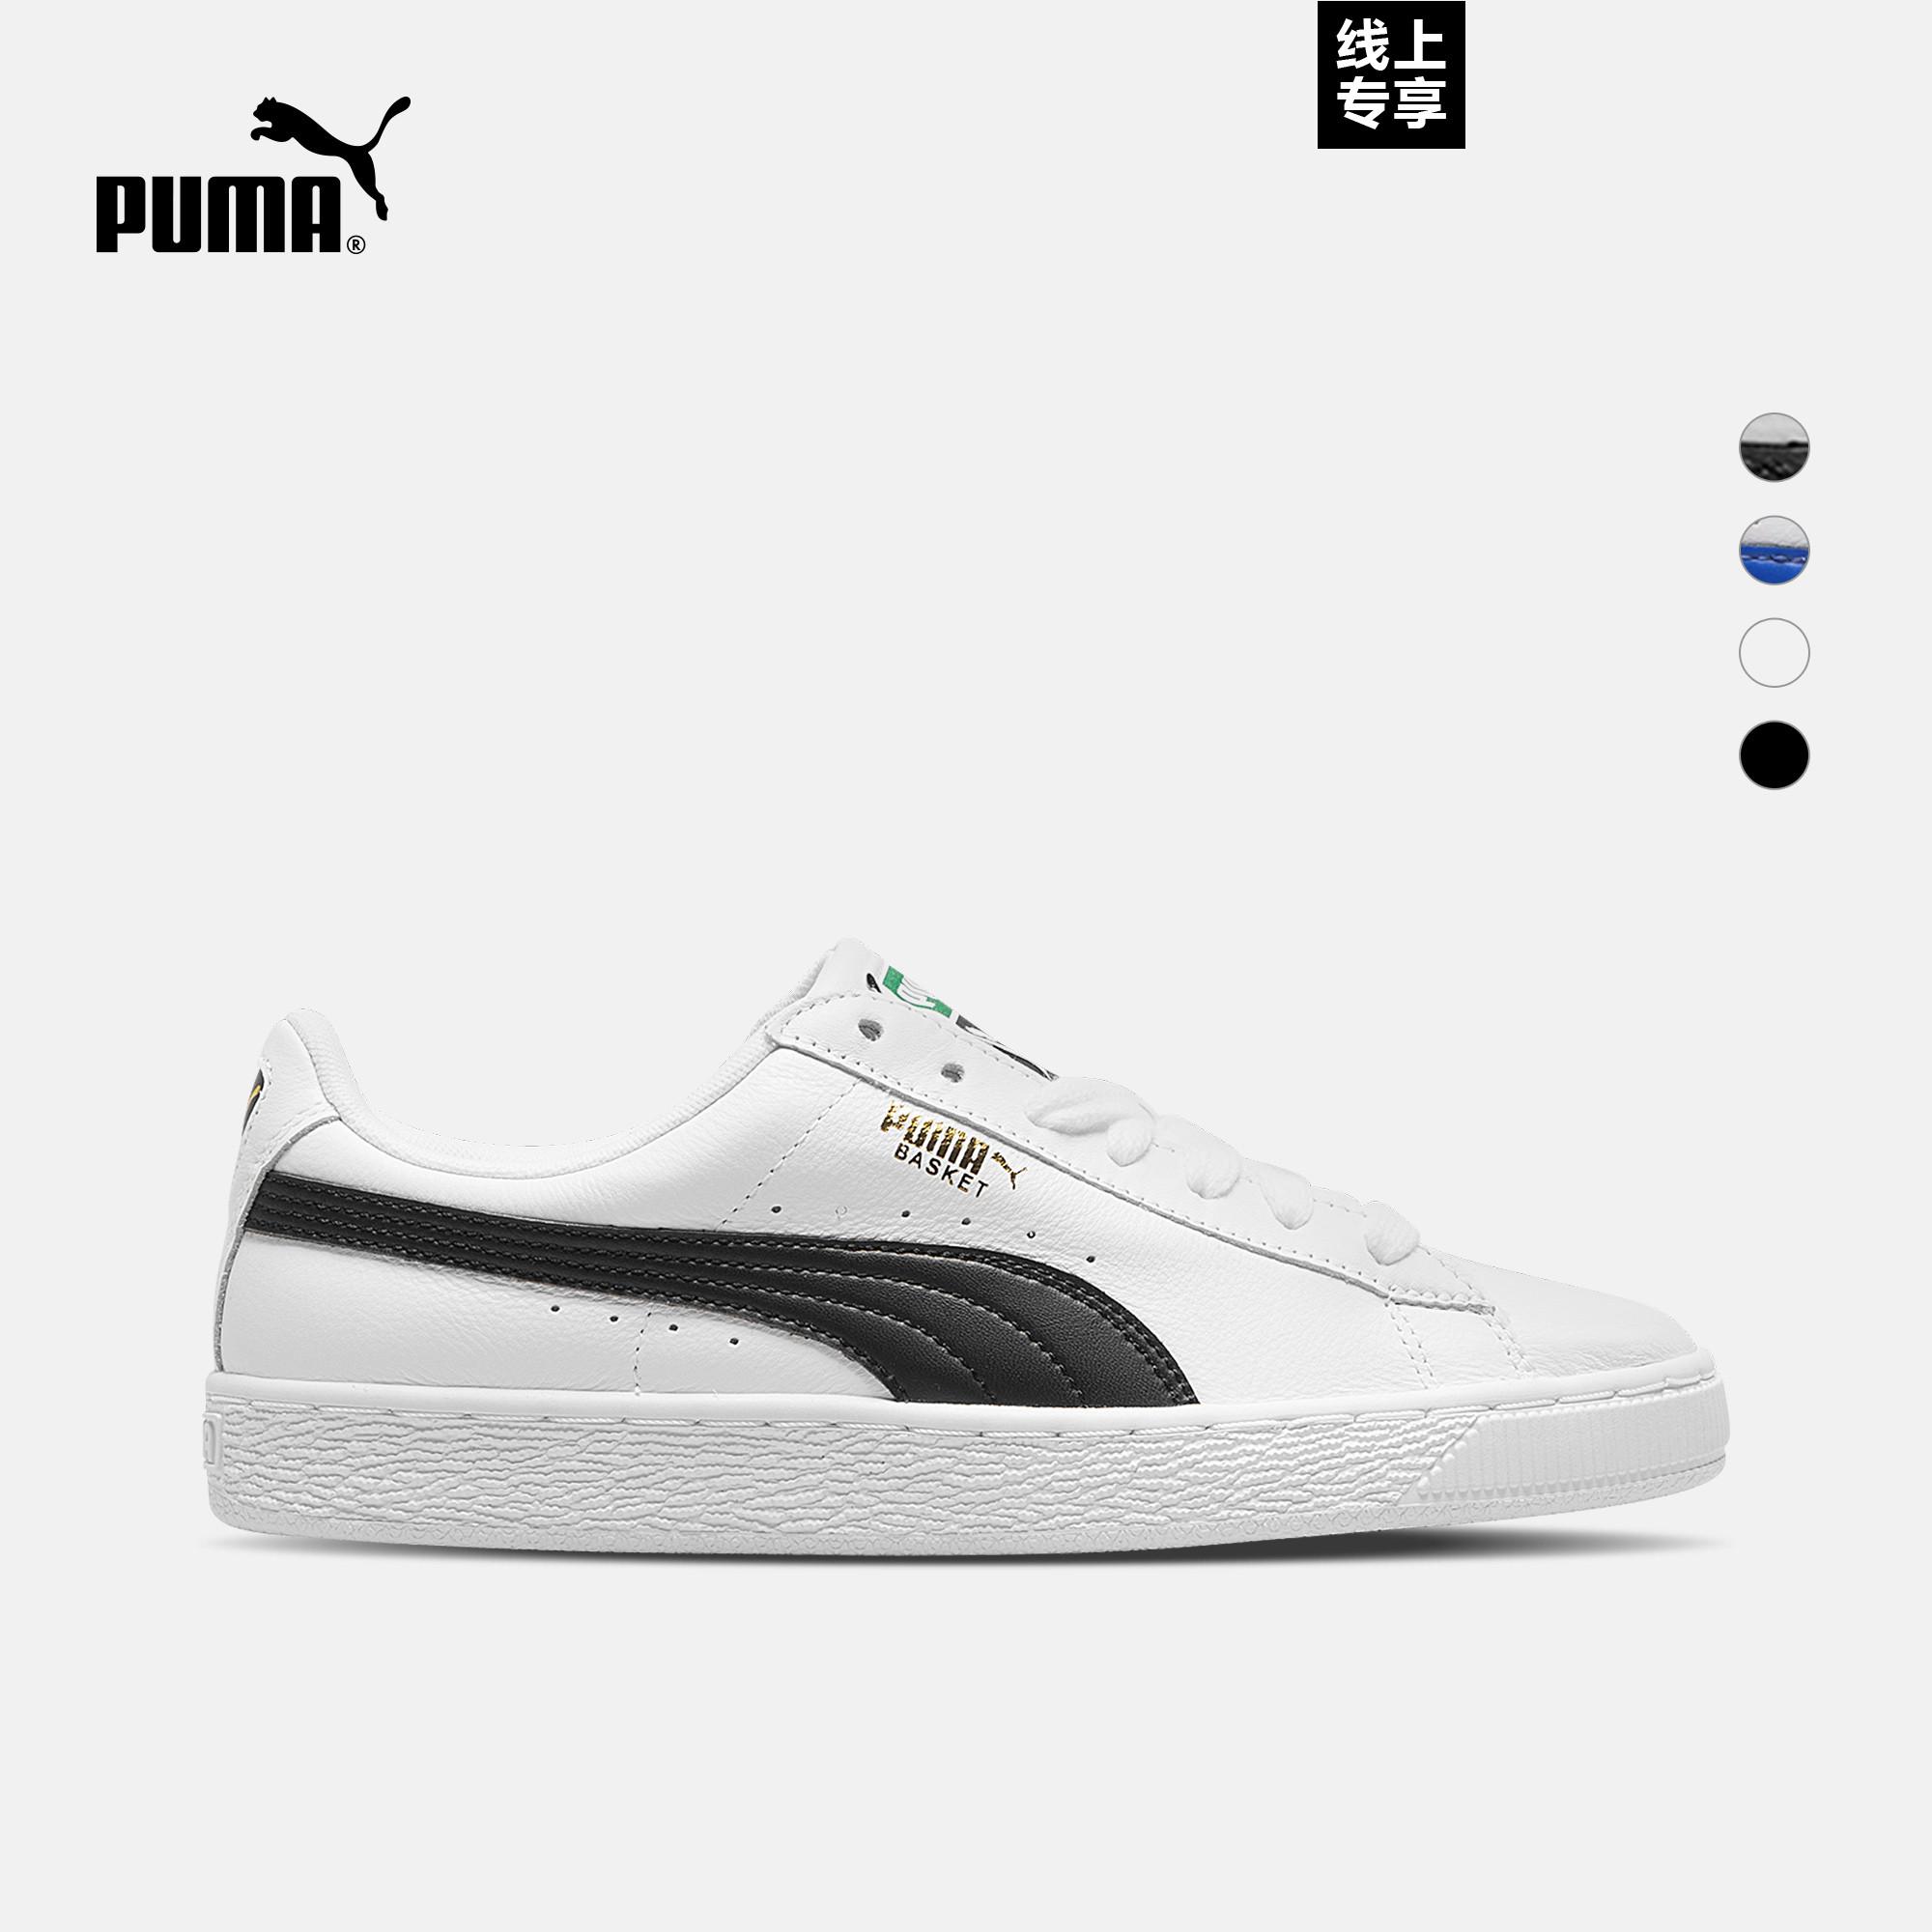 PUMA彪马官方 刘昊然同款 男女同款休闲鞋 Basket Classic 354367